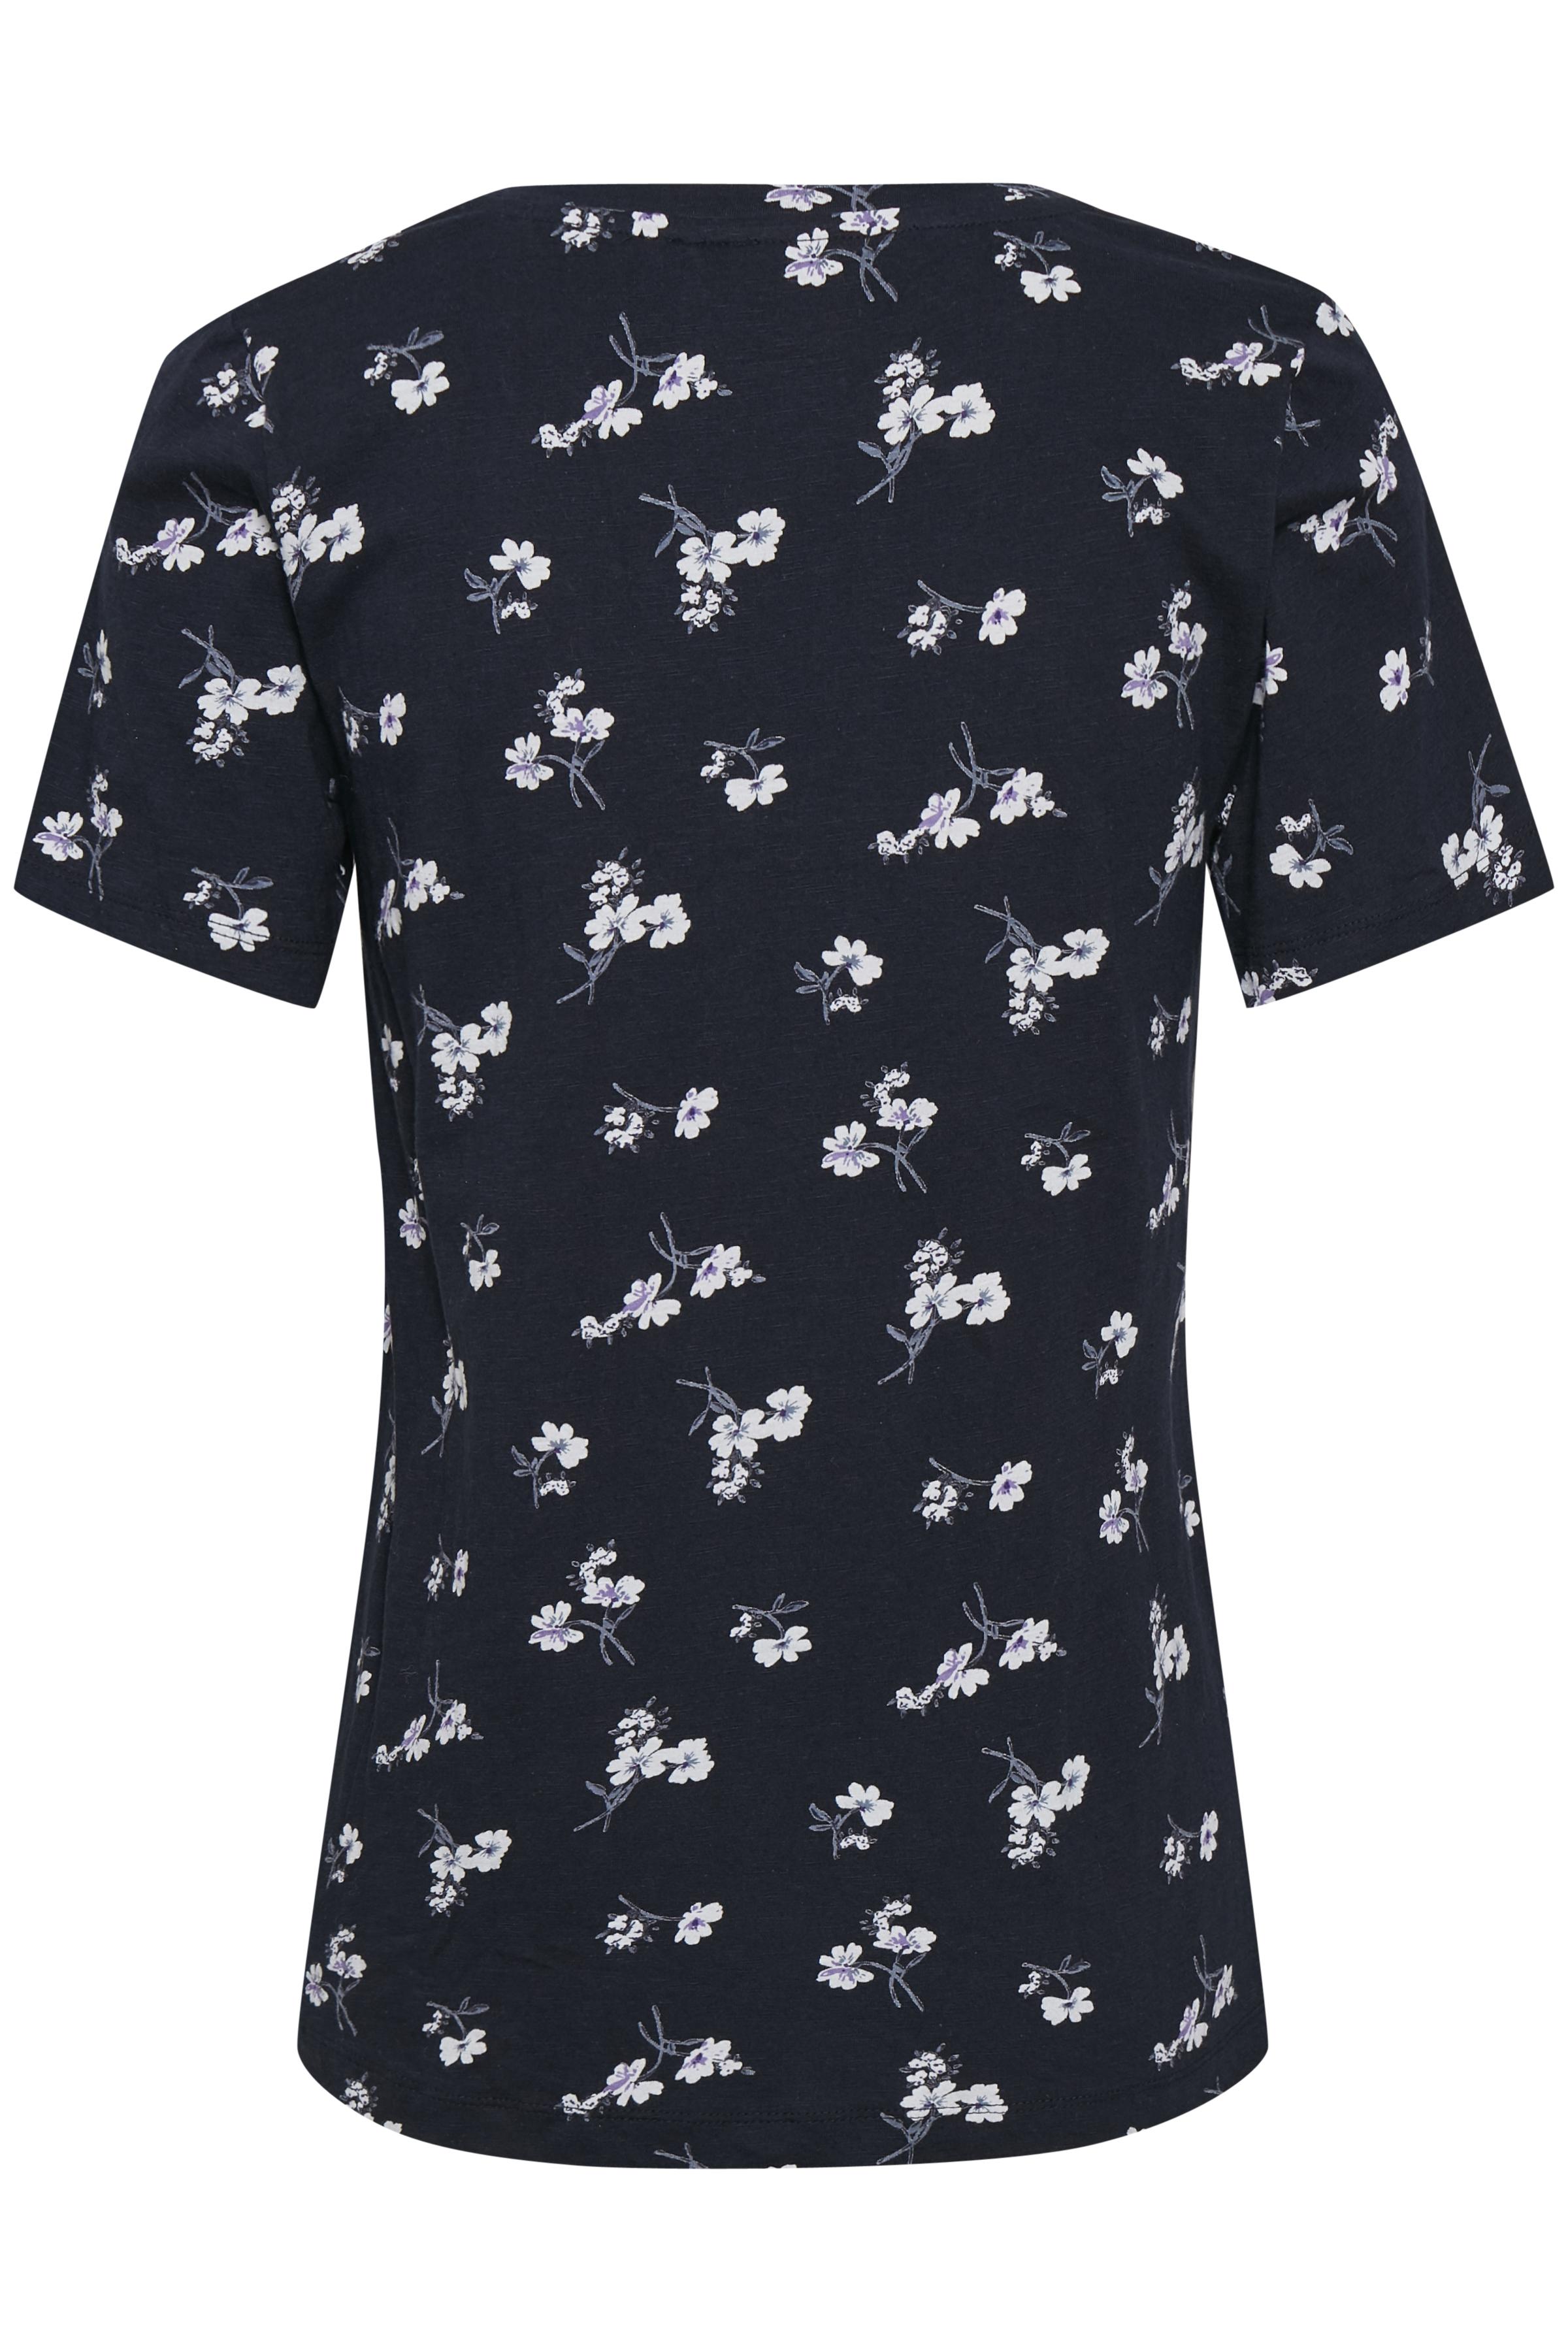 Marineblauw/wit T-shirt korte mouw van Kaffe – Door Marineblauw/wit T-shirt korte mouw van maat. XS-XXL hier